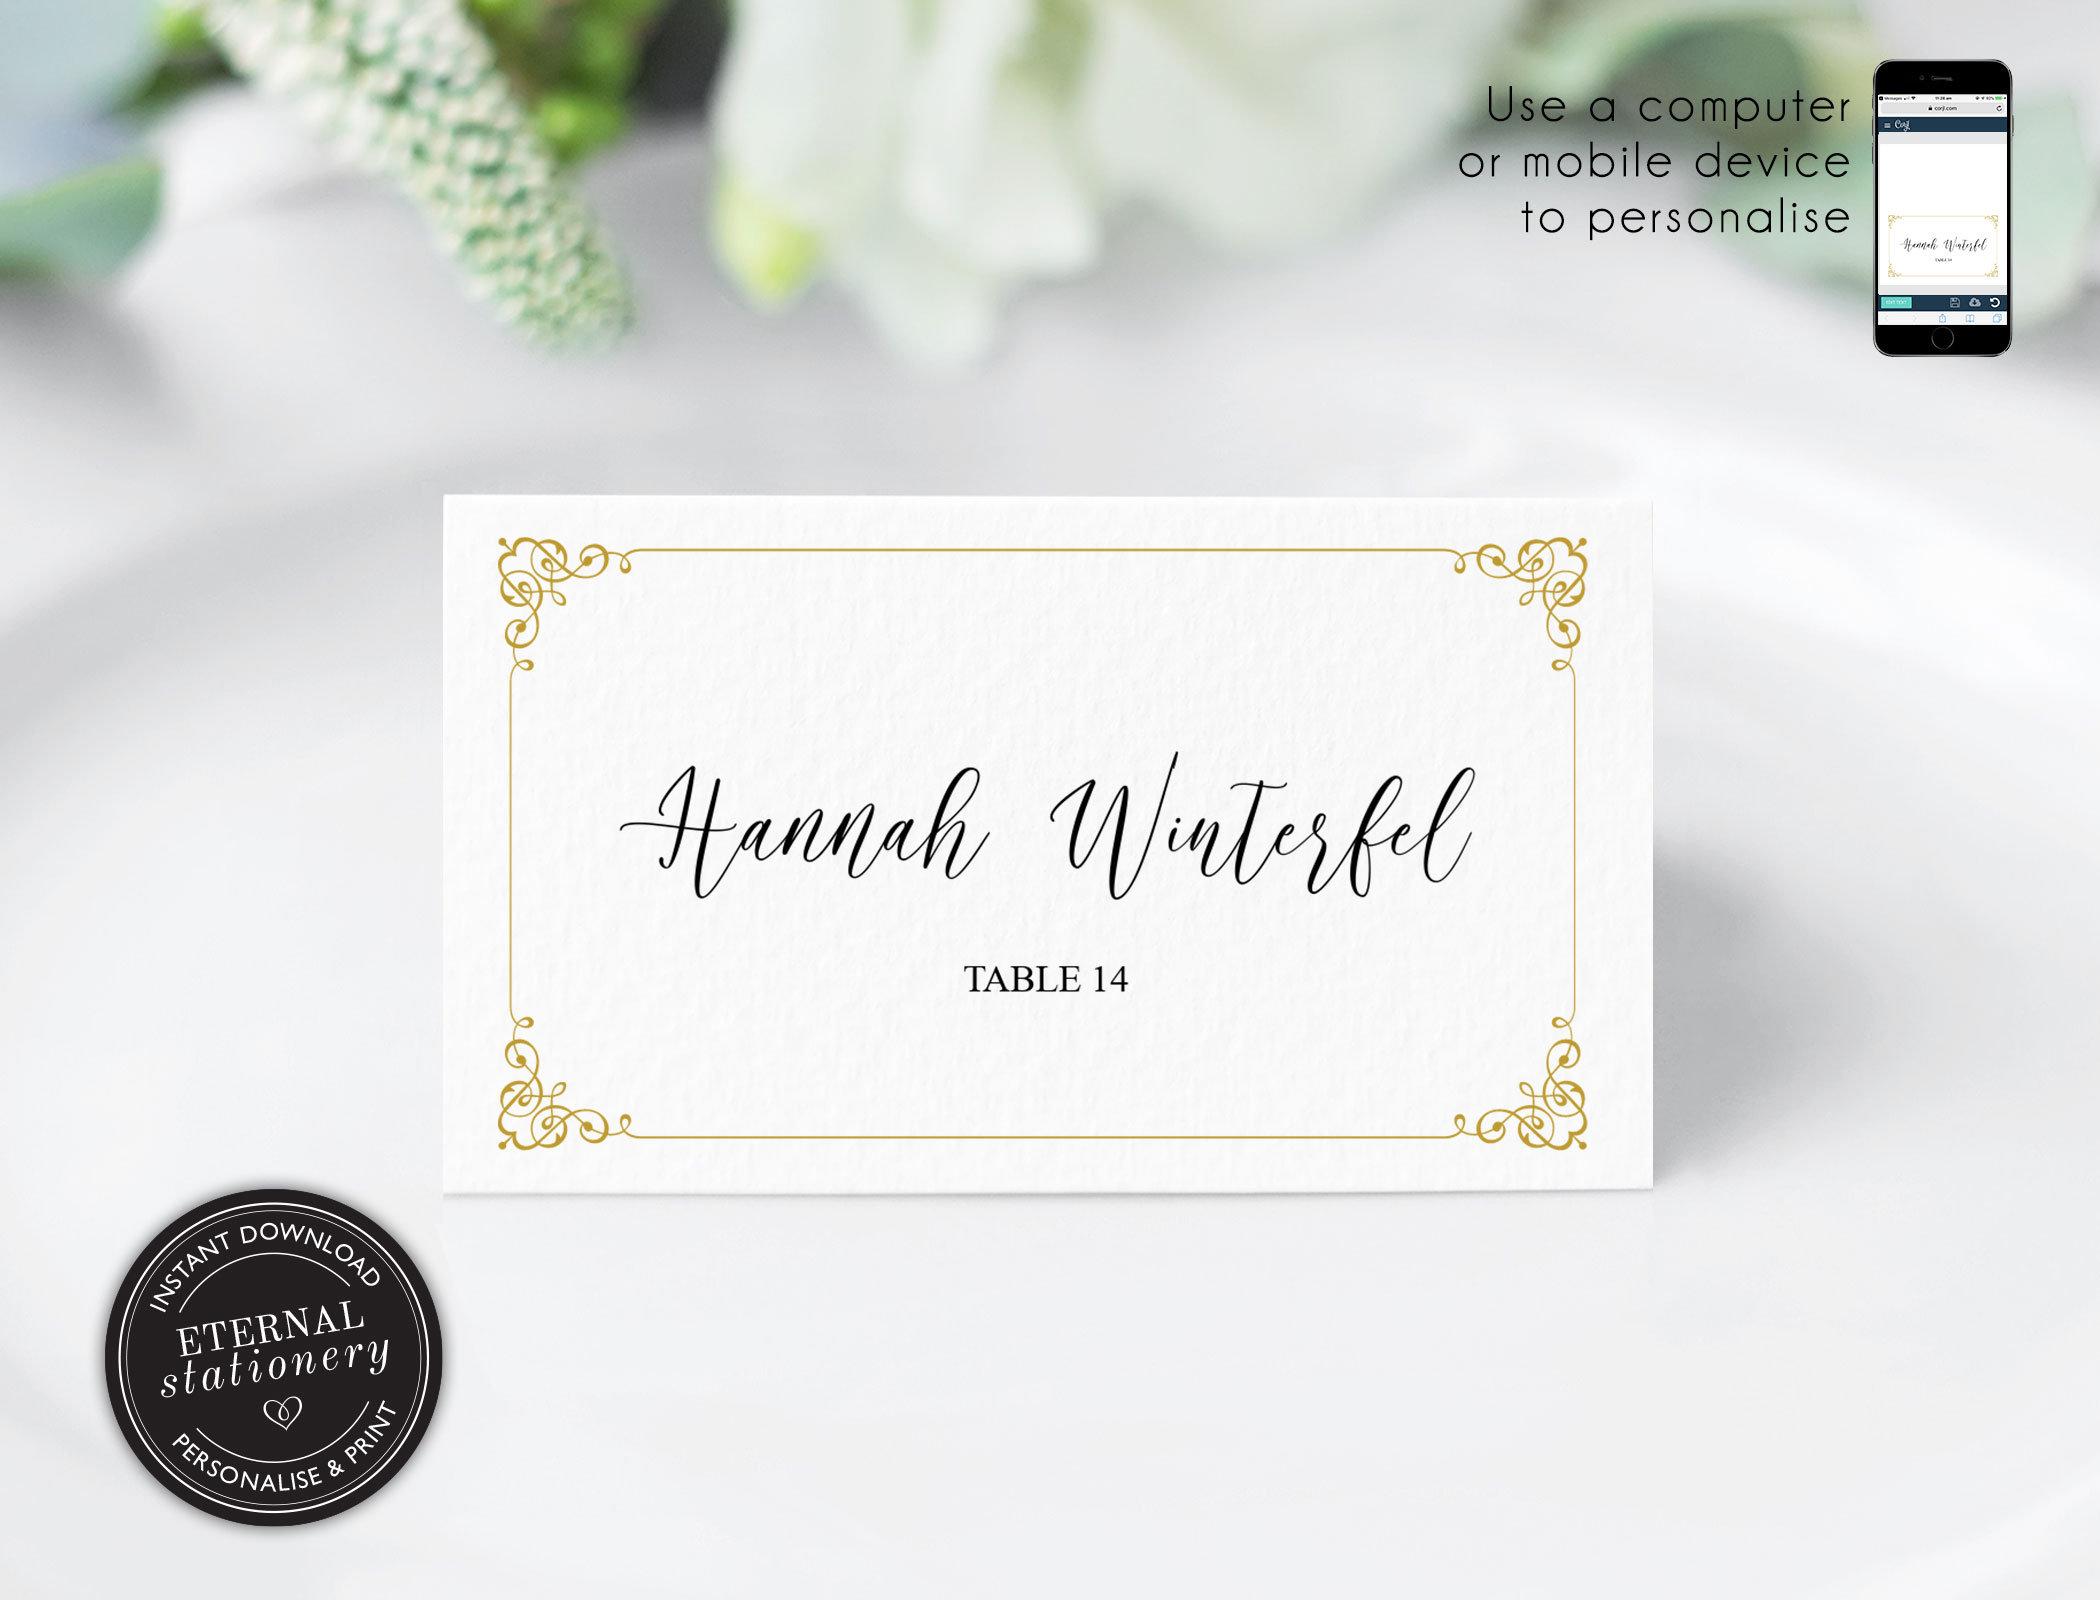 Editable Place Card Template, Wedding Place Cards, Tent Card, Name Card,  Table Card, Place Card, Engagement, Birthday, Elegant, Hannah Regarding Microsoft Word Place Card Template